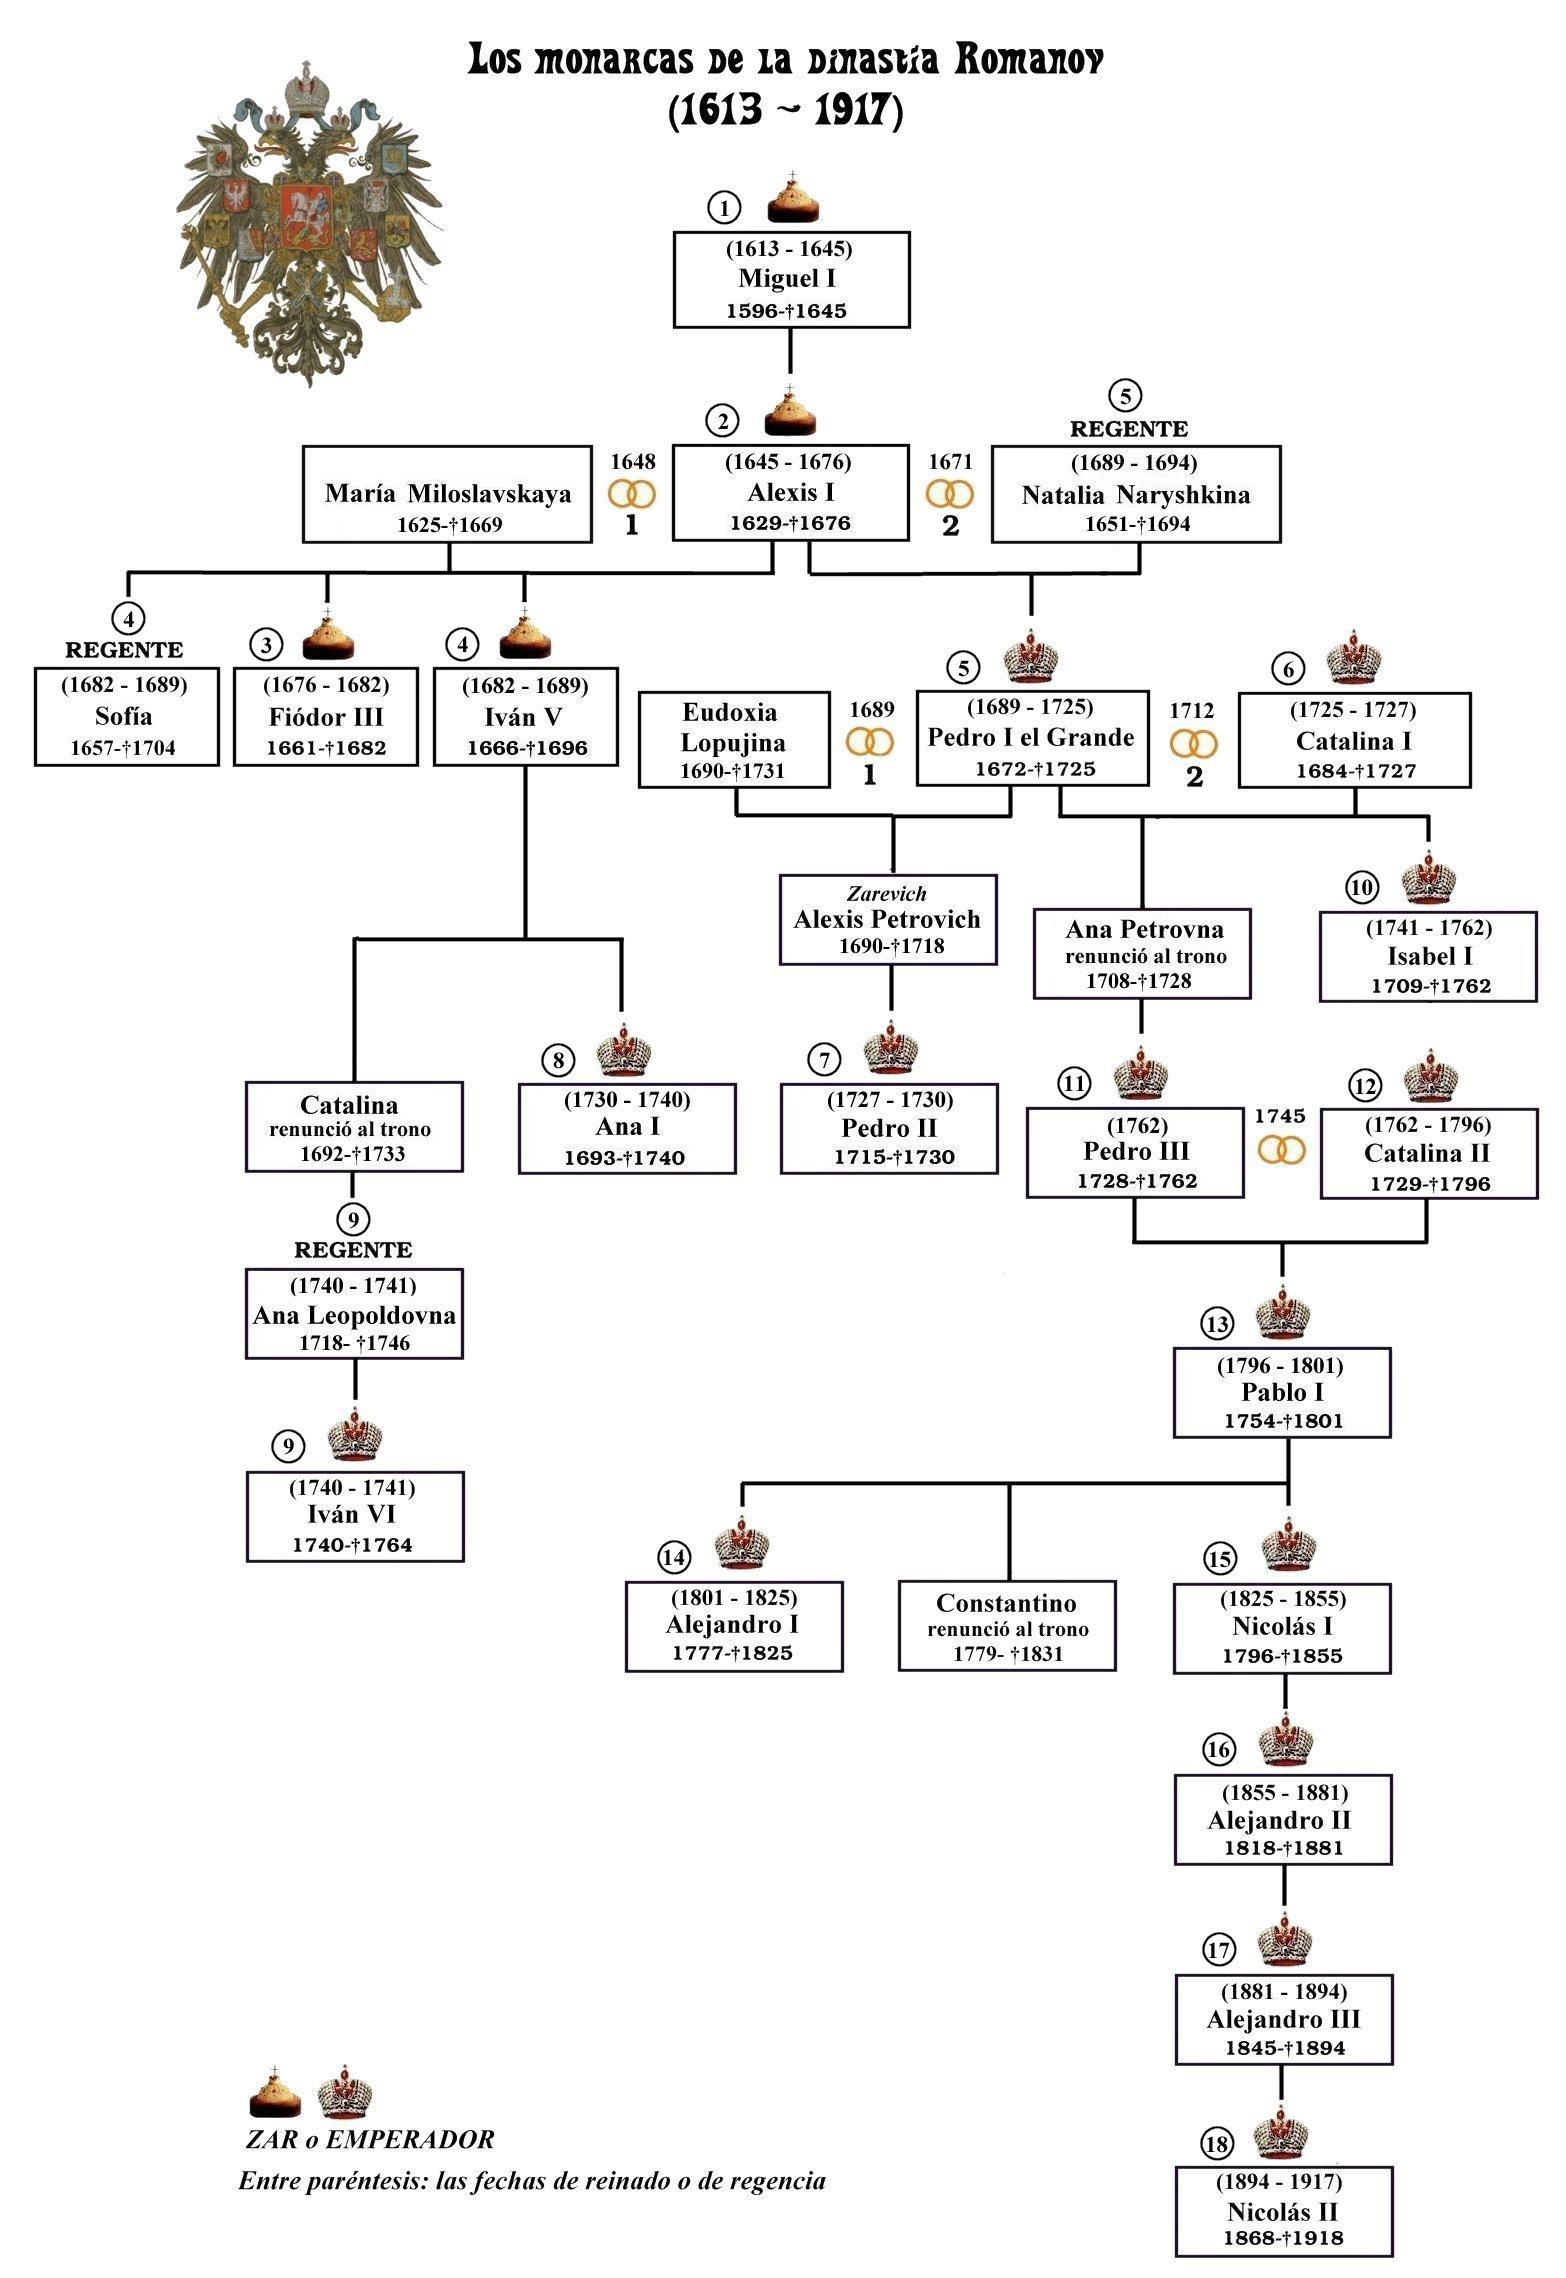 https://upload.wikimedia.org/wikipedia/commons/e/ef/Romanov-monarcas-dinastia-es.jpg